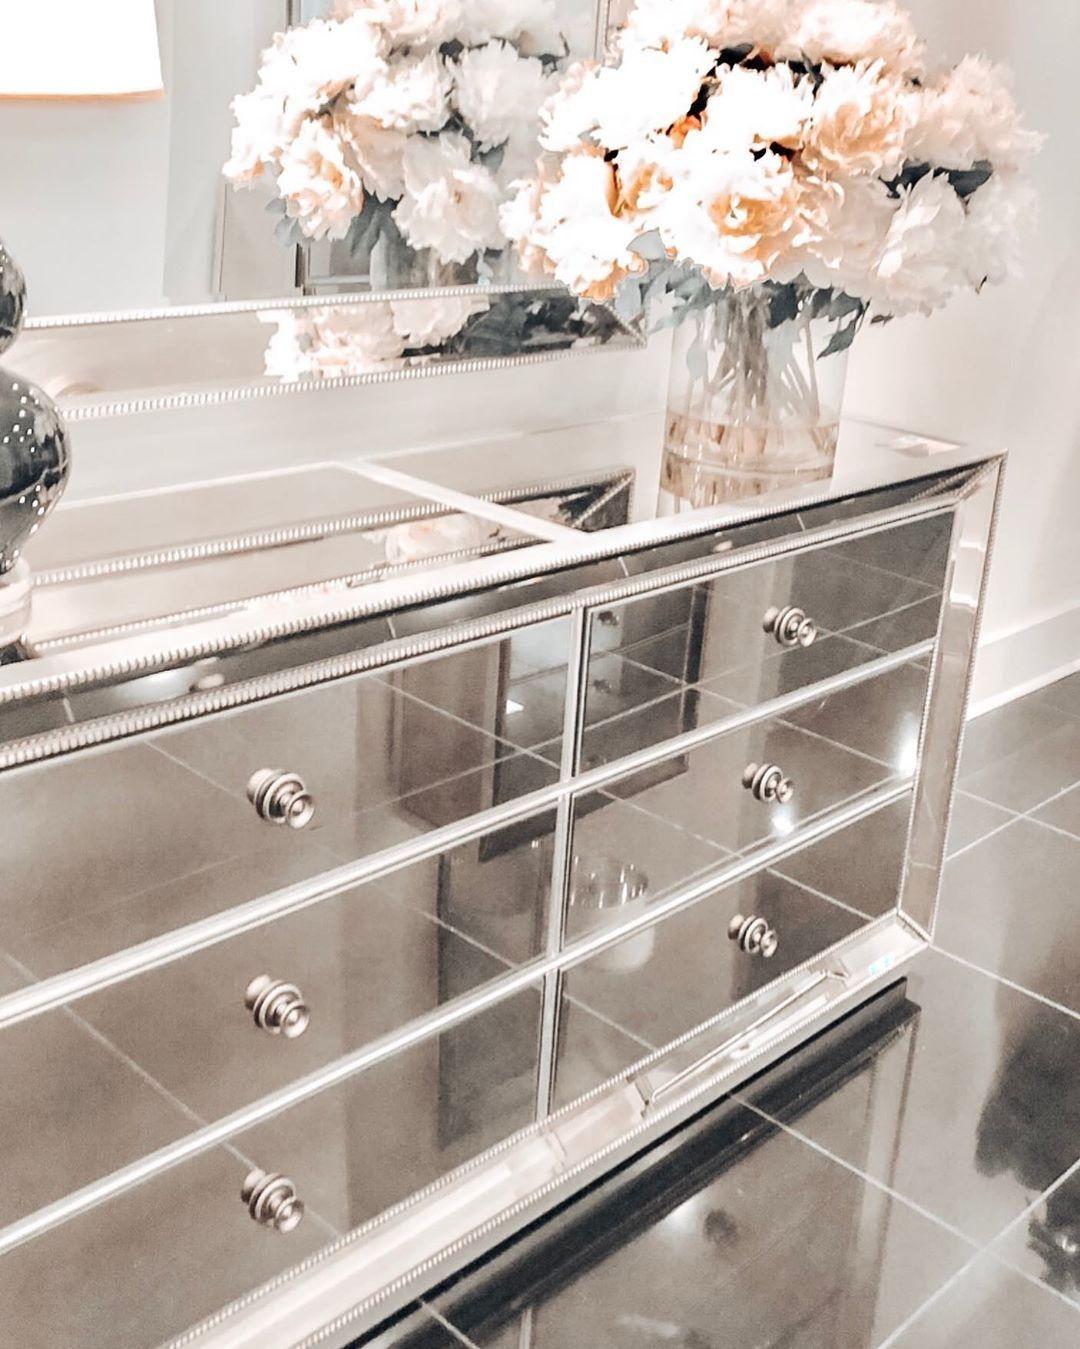 #Repost @cocofurnituregallery •  •  •  •  • Our XL Mirrored Dresser! Take it home with just $49 Down! Apply today @cocofurnituregallery 💕 -  #realtor #realestatemiami #love #midtownmiami #interiordesign #southflorida #westpalmbeach #boynton #weston #miamiliving #fashion #lovedecor #homedecor #luxury #glam #milliondollarlisting #forbes #glamour #furniture #bohodecor #developer #homestyling #inspiration #travel #beautiful #bohostyle #architecture #dreamhouse #modernfurnituredesign